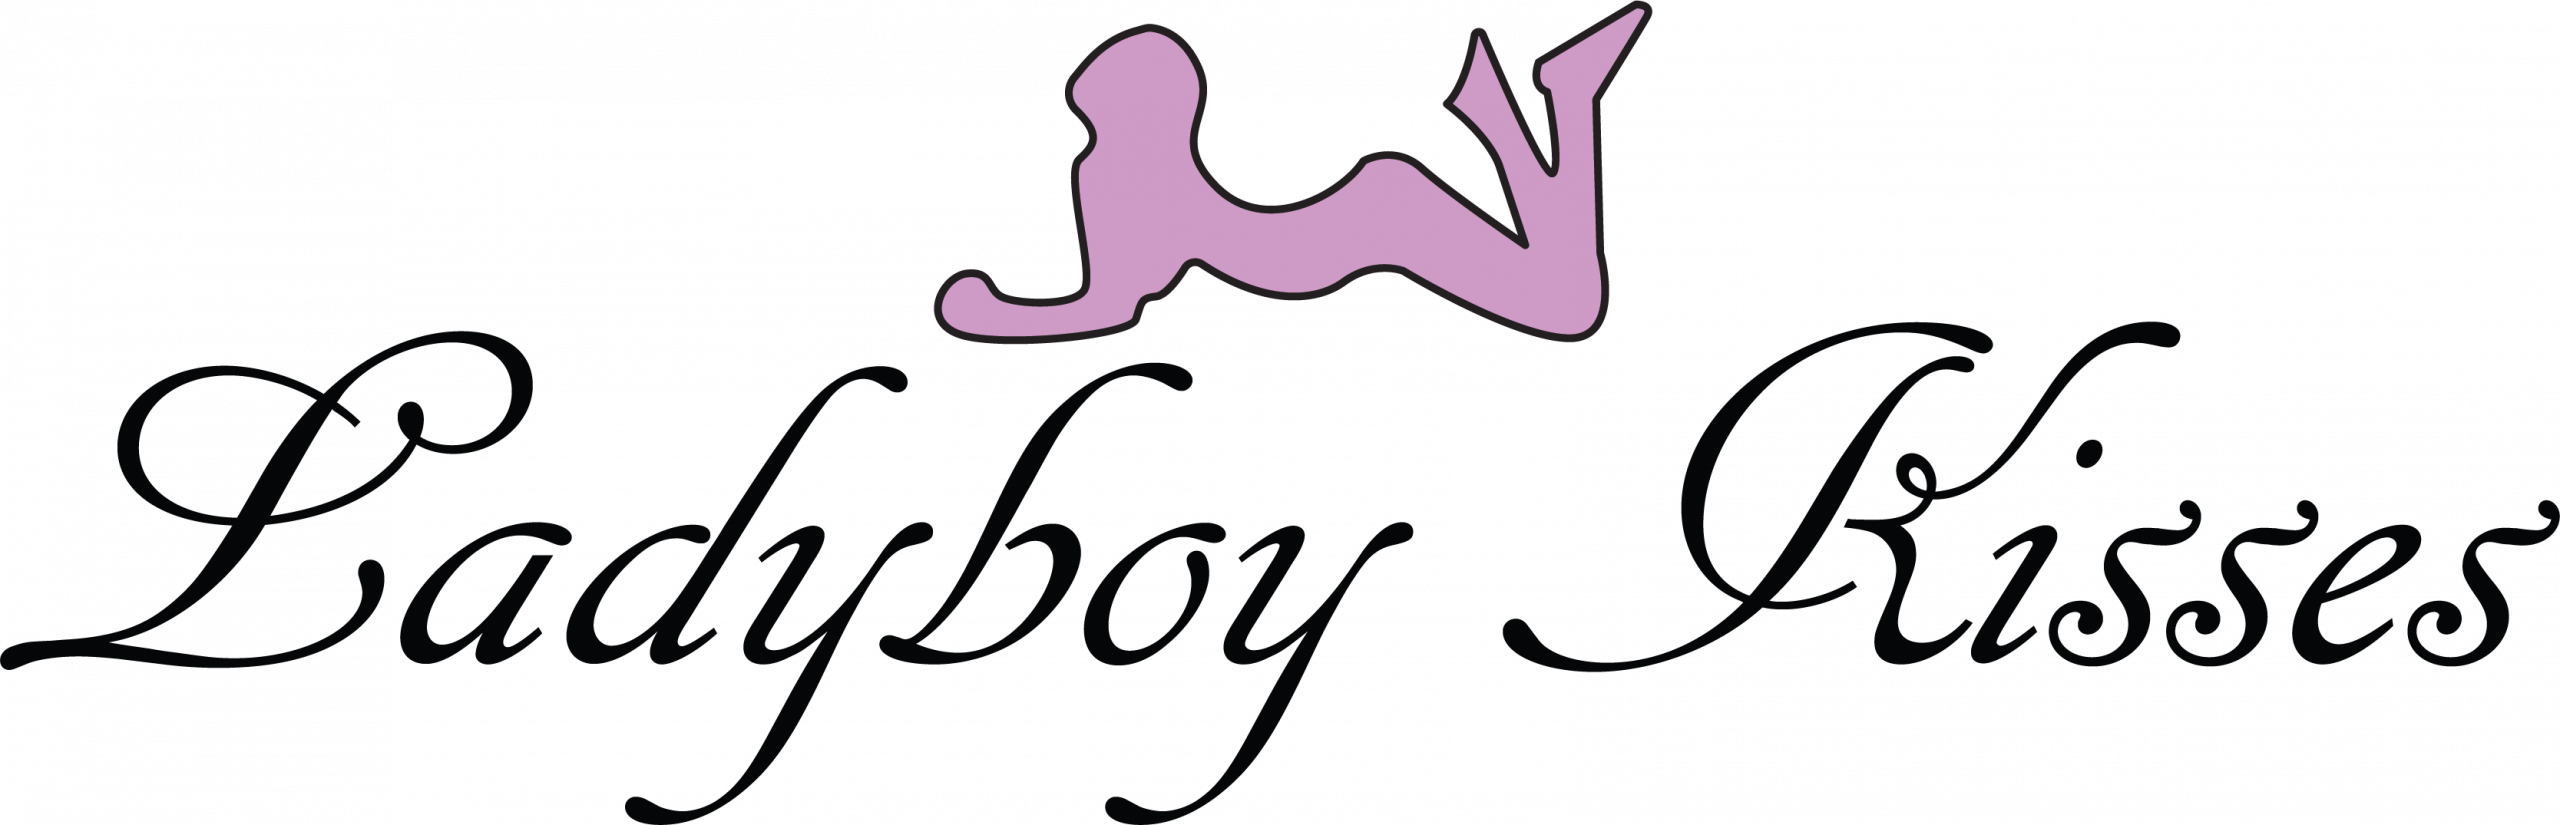 ladyboykisses-logo